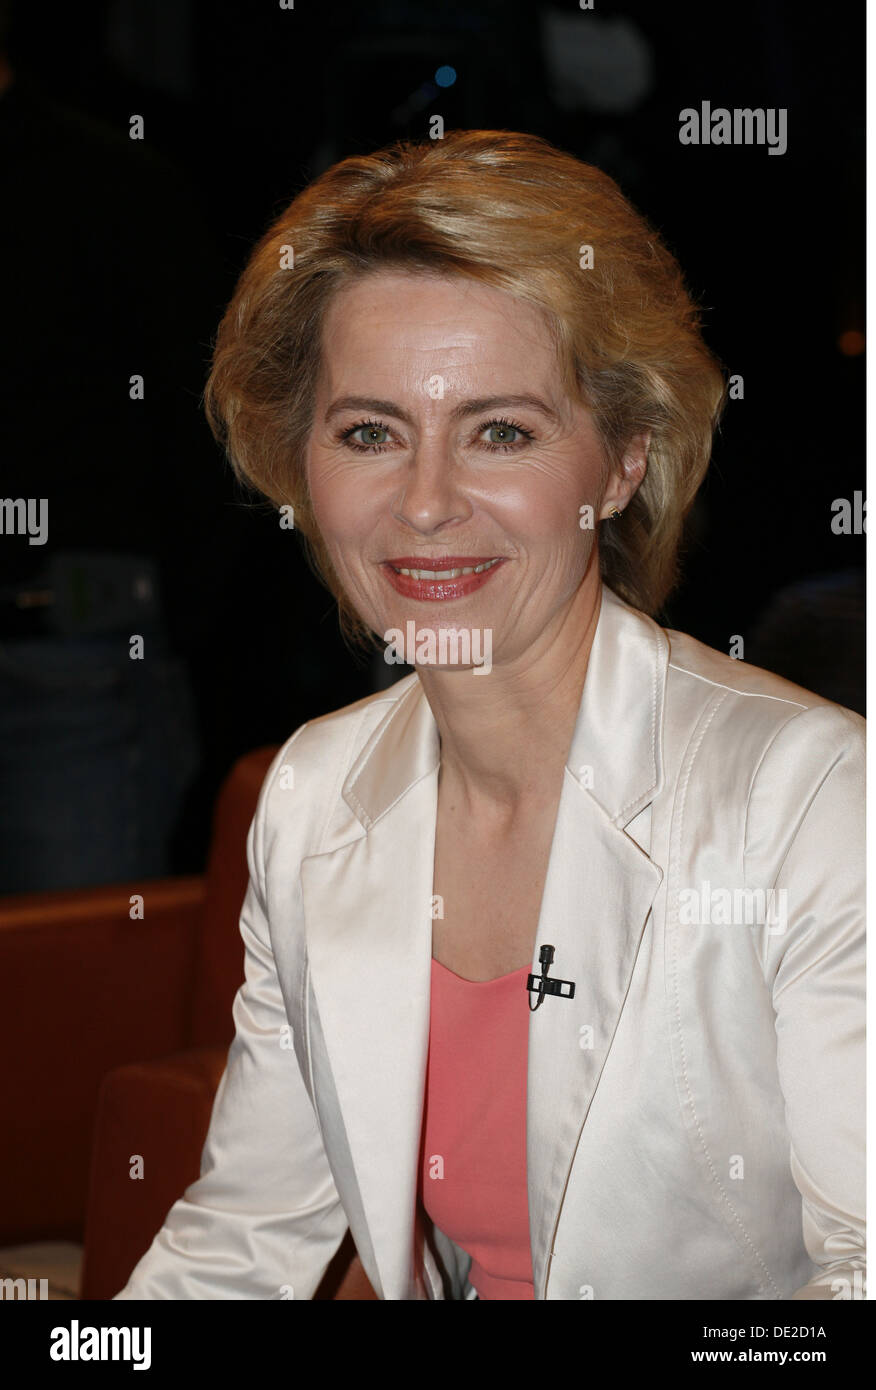 Leyen, Ursula von der, * 8.10.1958, German politician (Christian Democratic Union), portrait, guest in the telecast 'NDR Talk Show', Hamburg, Germany, 24.5.2013, Additional-Rights-Clearances-NA - Stock Image